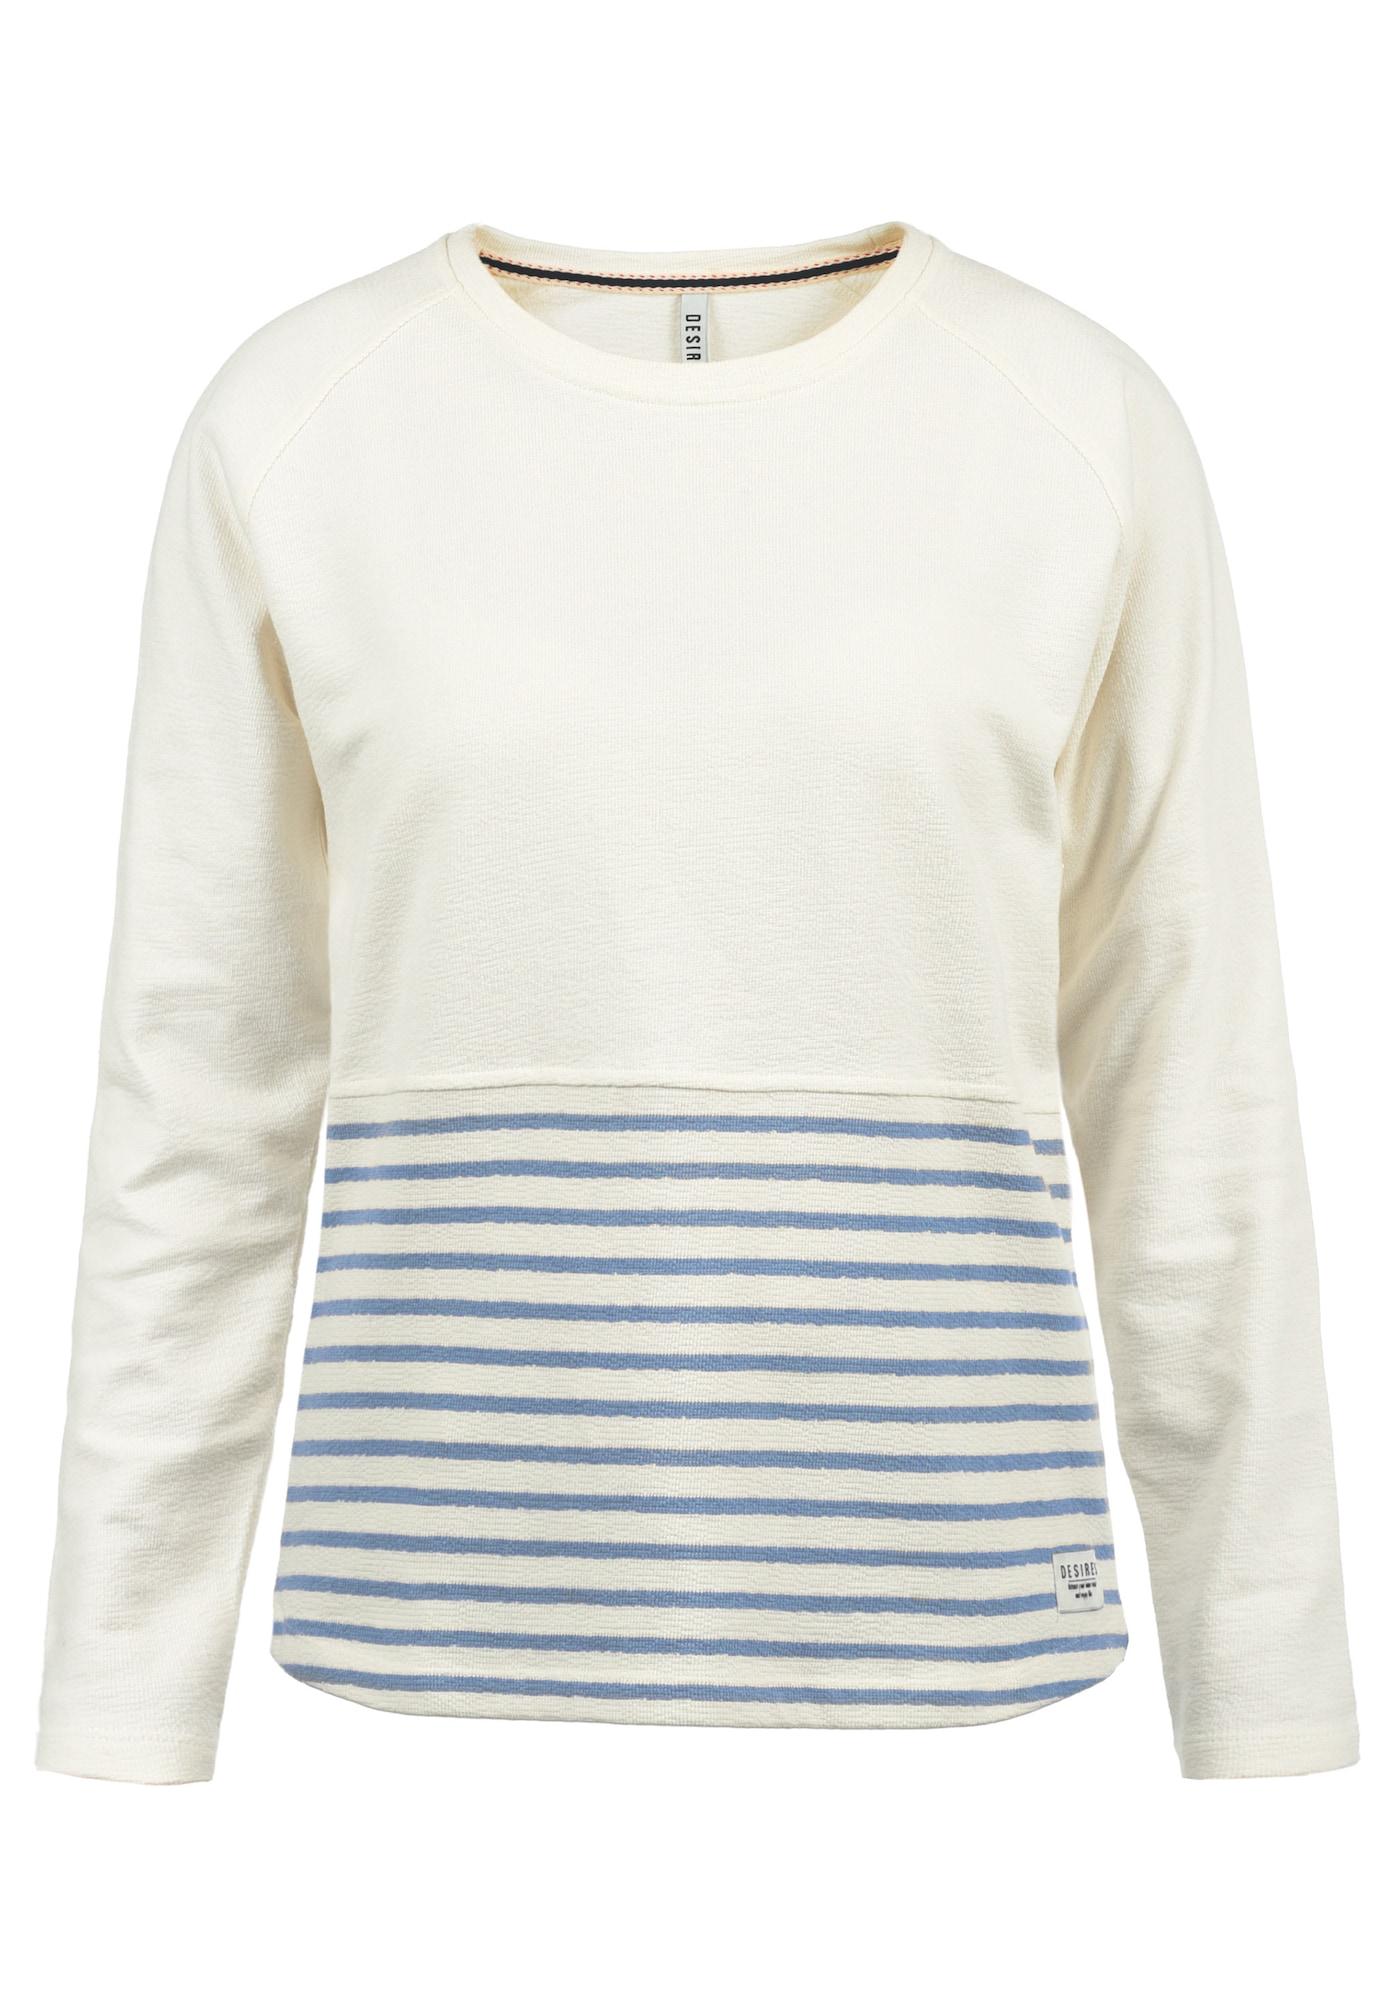 Sweatshirt 'Piper'   Bekleidung > Sweatshirts & -jacken > Sweatshirts   Desires